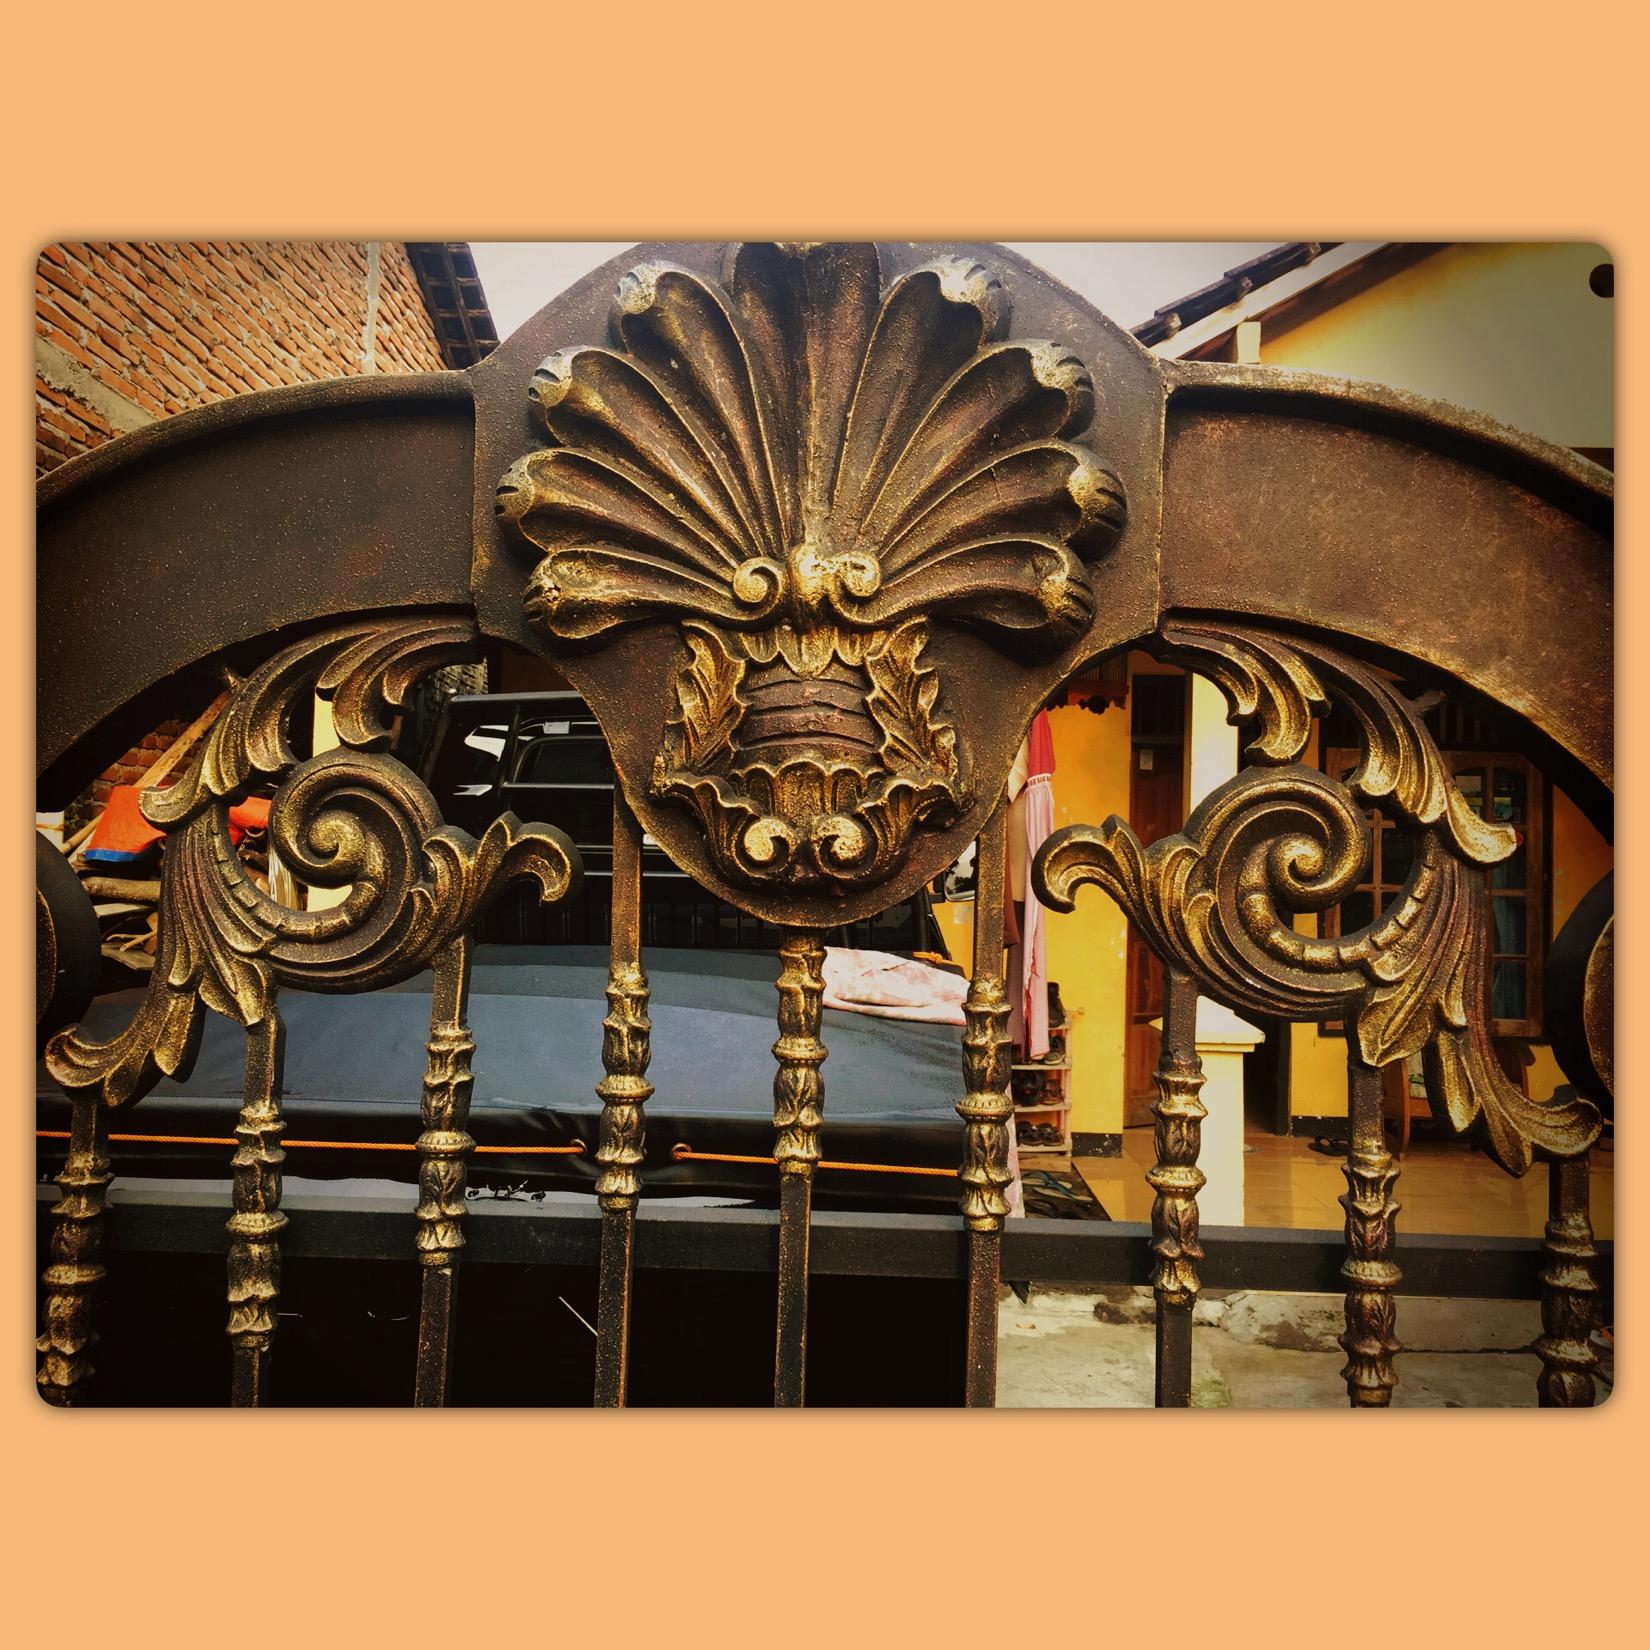 #wa085945443684pinbb54ecb664 #pagar #pagarbesitempa #pagarrumah #pagarbesi #besi #besitempa #besitempaklasikjakarta #besitempaklasik #besitempaserpong #pintugerbang #pintu #pinturumah #pintuminimalis #kanopi #kanopimurah #kanopiminimalis #kanopibesi #kanopirumah #kanopikaca #balkon #balkonien #balkonbesitempaklasik #balkonbesitempa #balkonbesi #tangga #tanggalayang #tanggalayangbesitempa#tanggalayangklasik#railling #raillingtanggabesitempa #raillingtangga #raillingbalkon #raillings